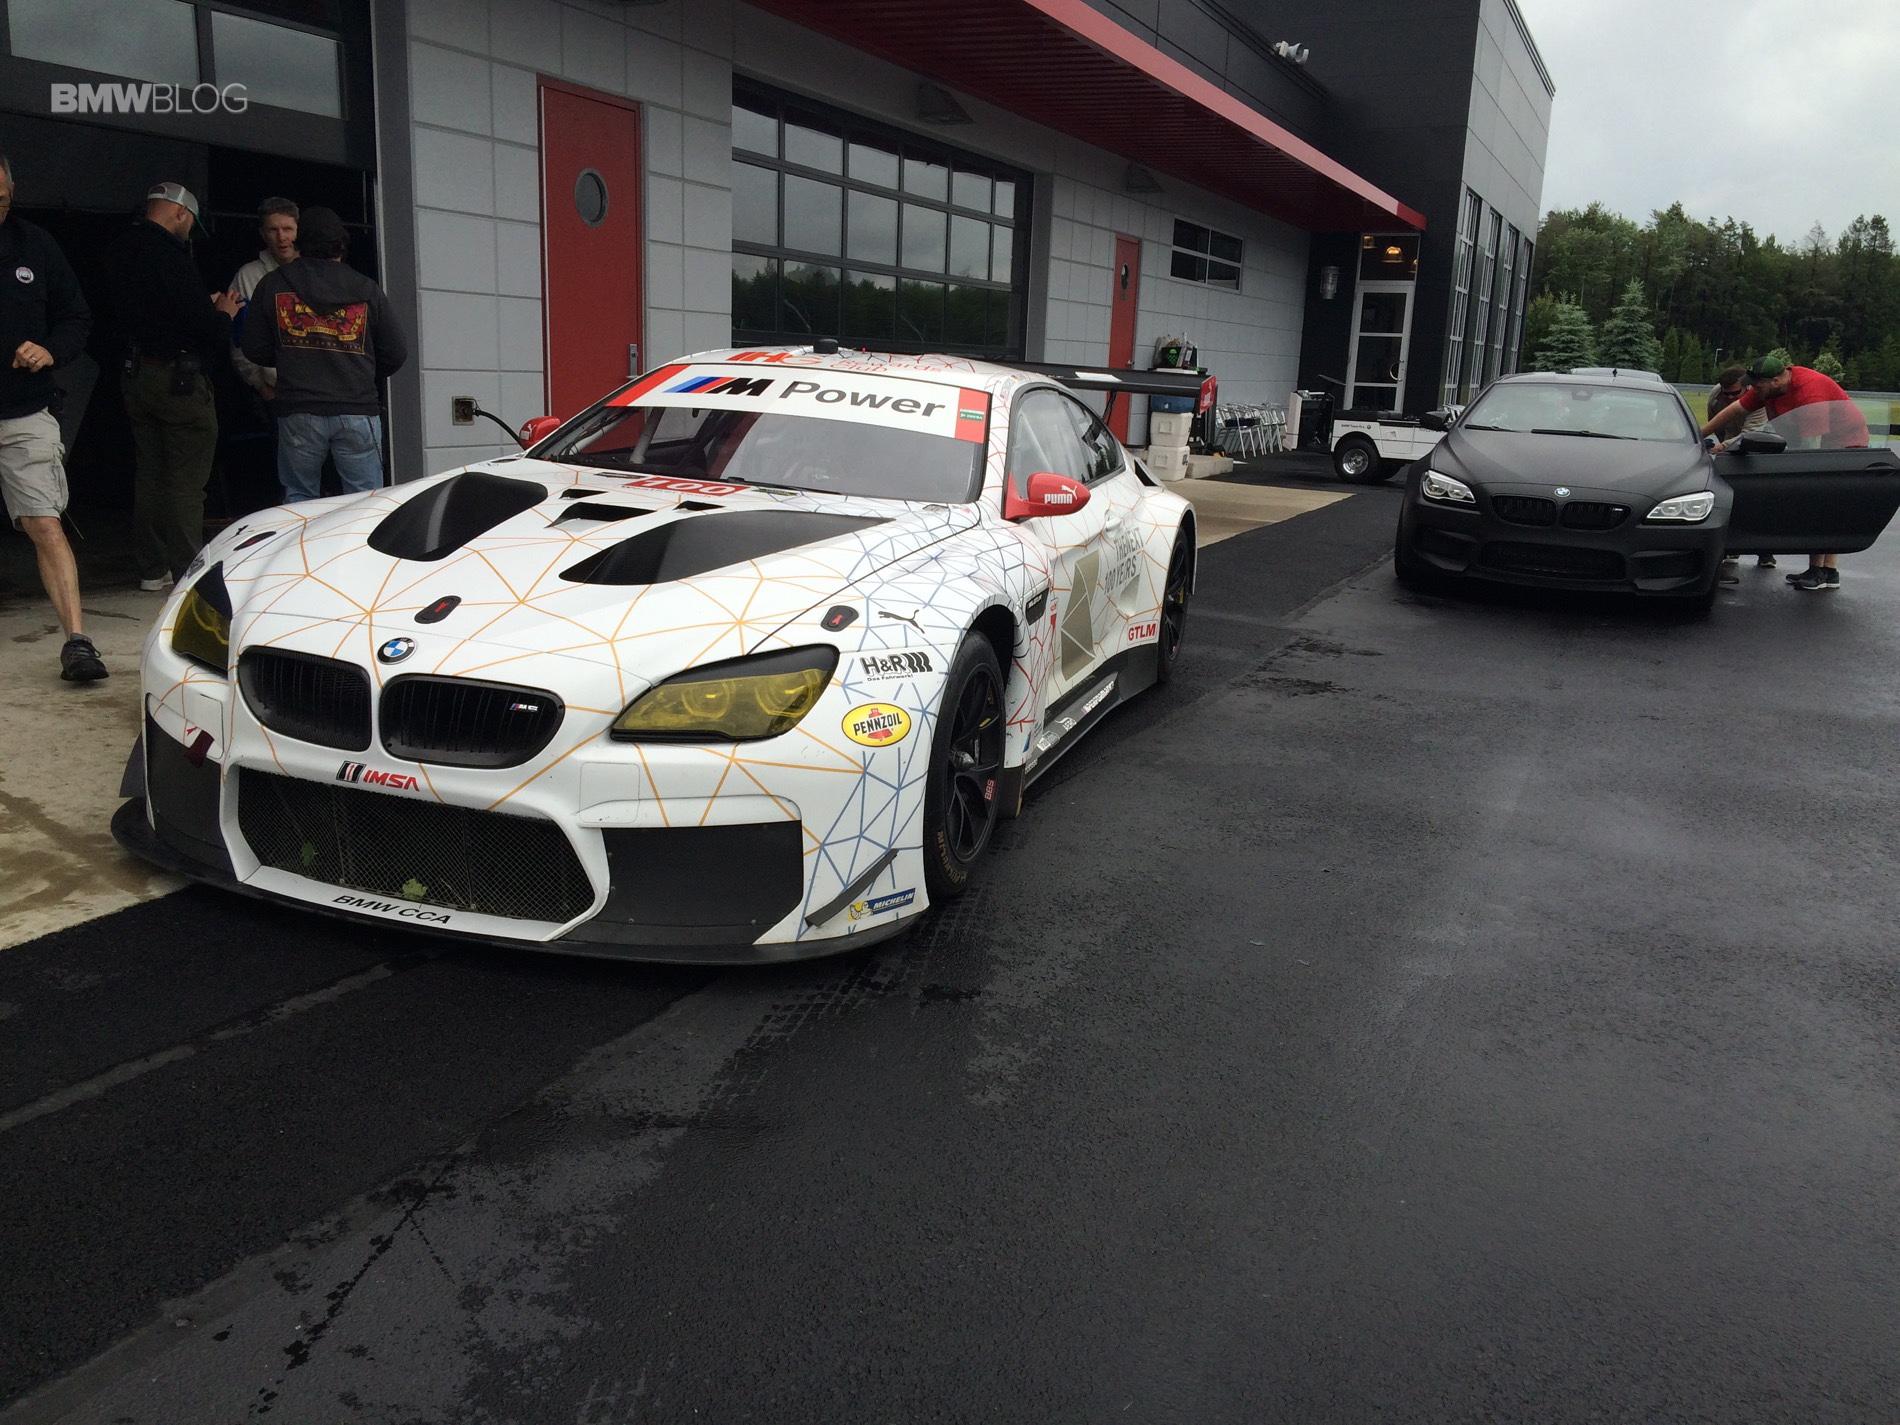 BMW driverless racing cars 3